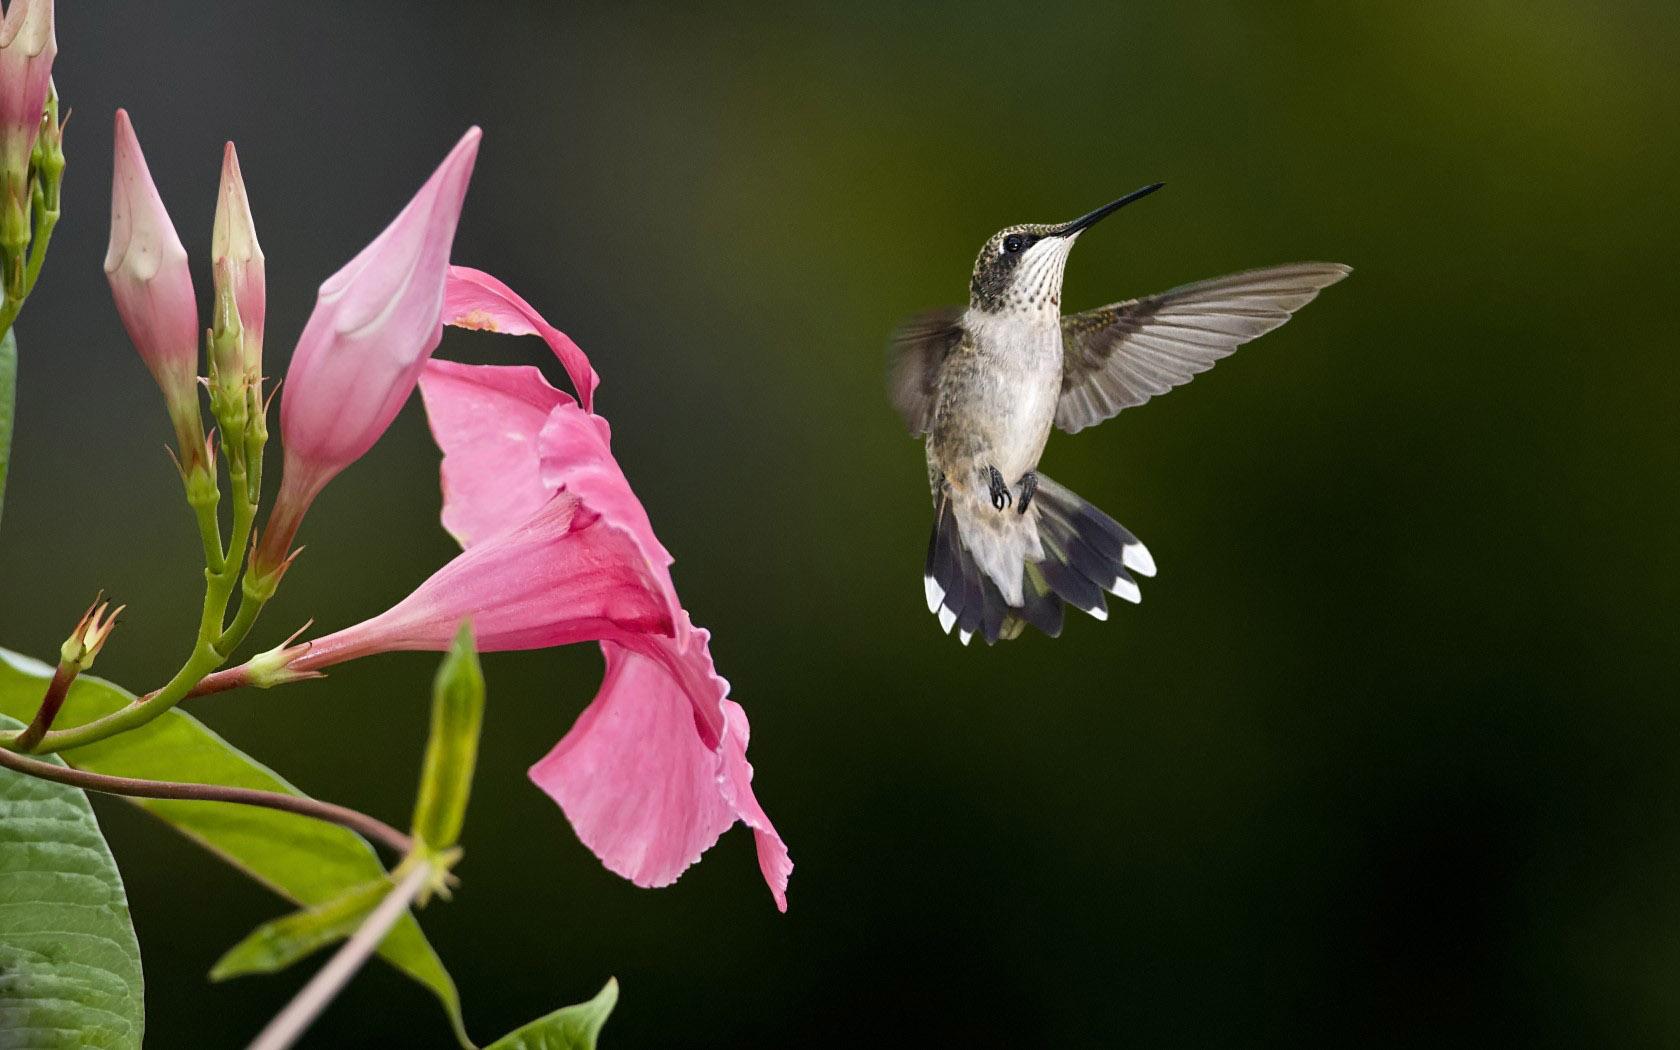 hummingbird images